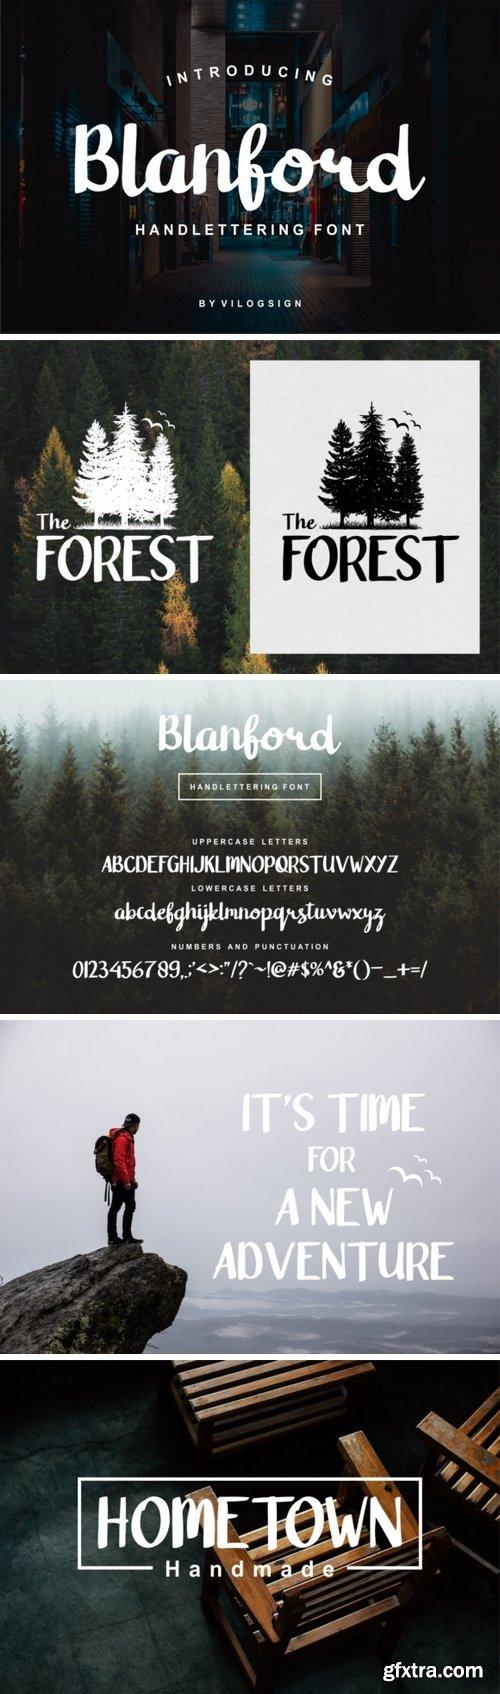 Blanford